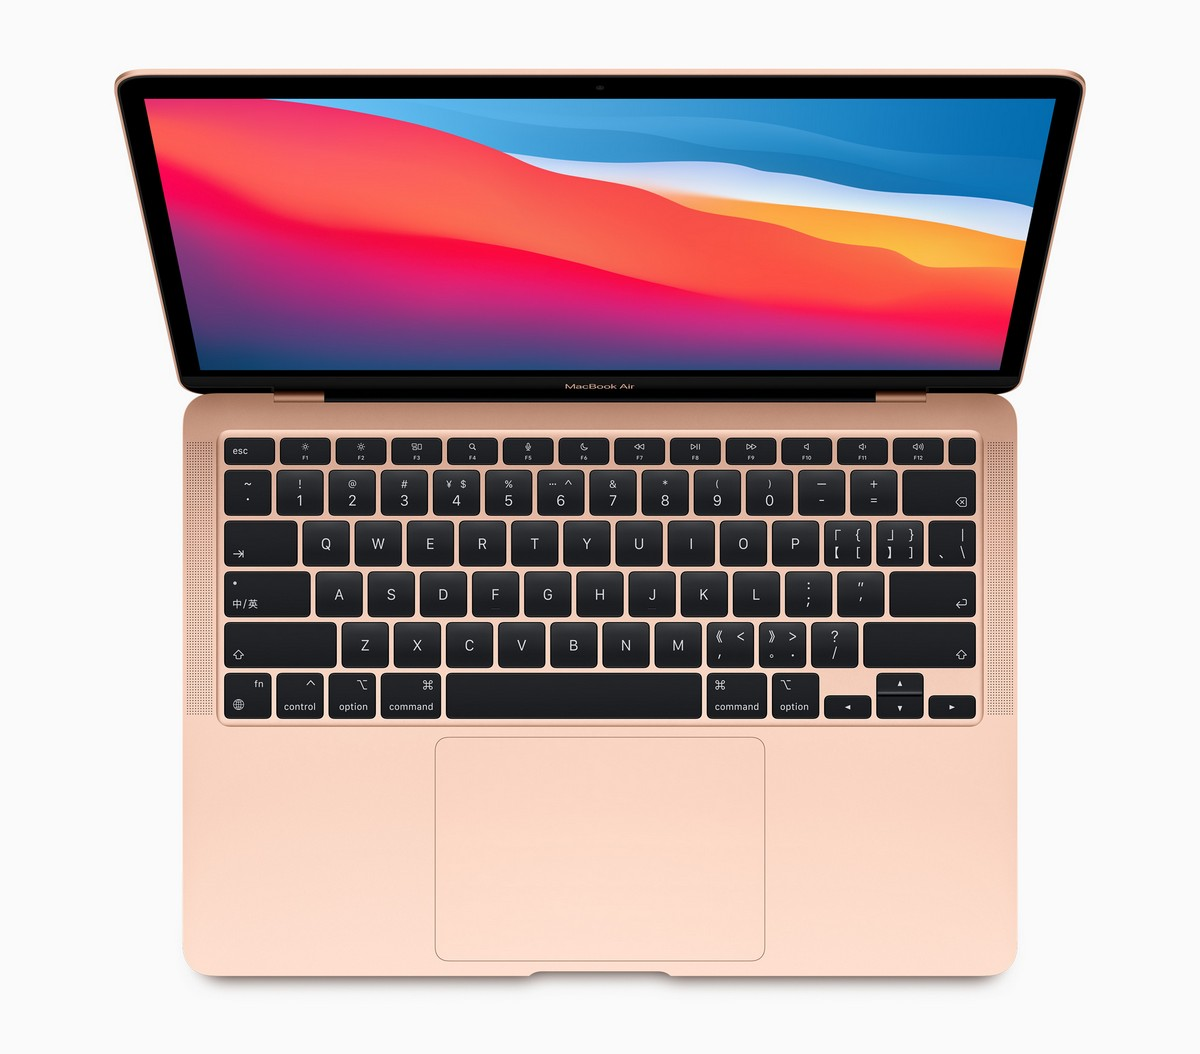 macbook air 2012 ファームウェア